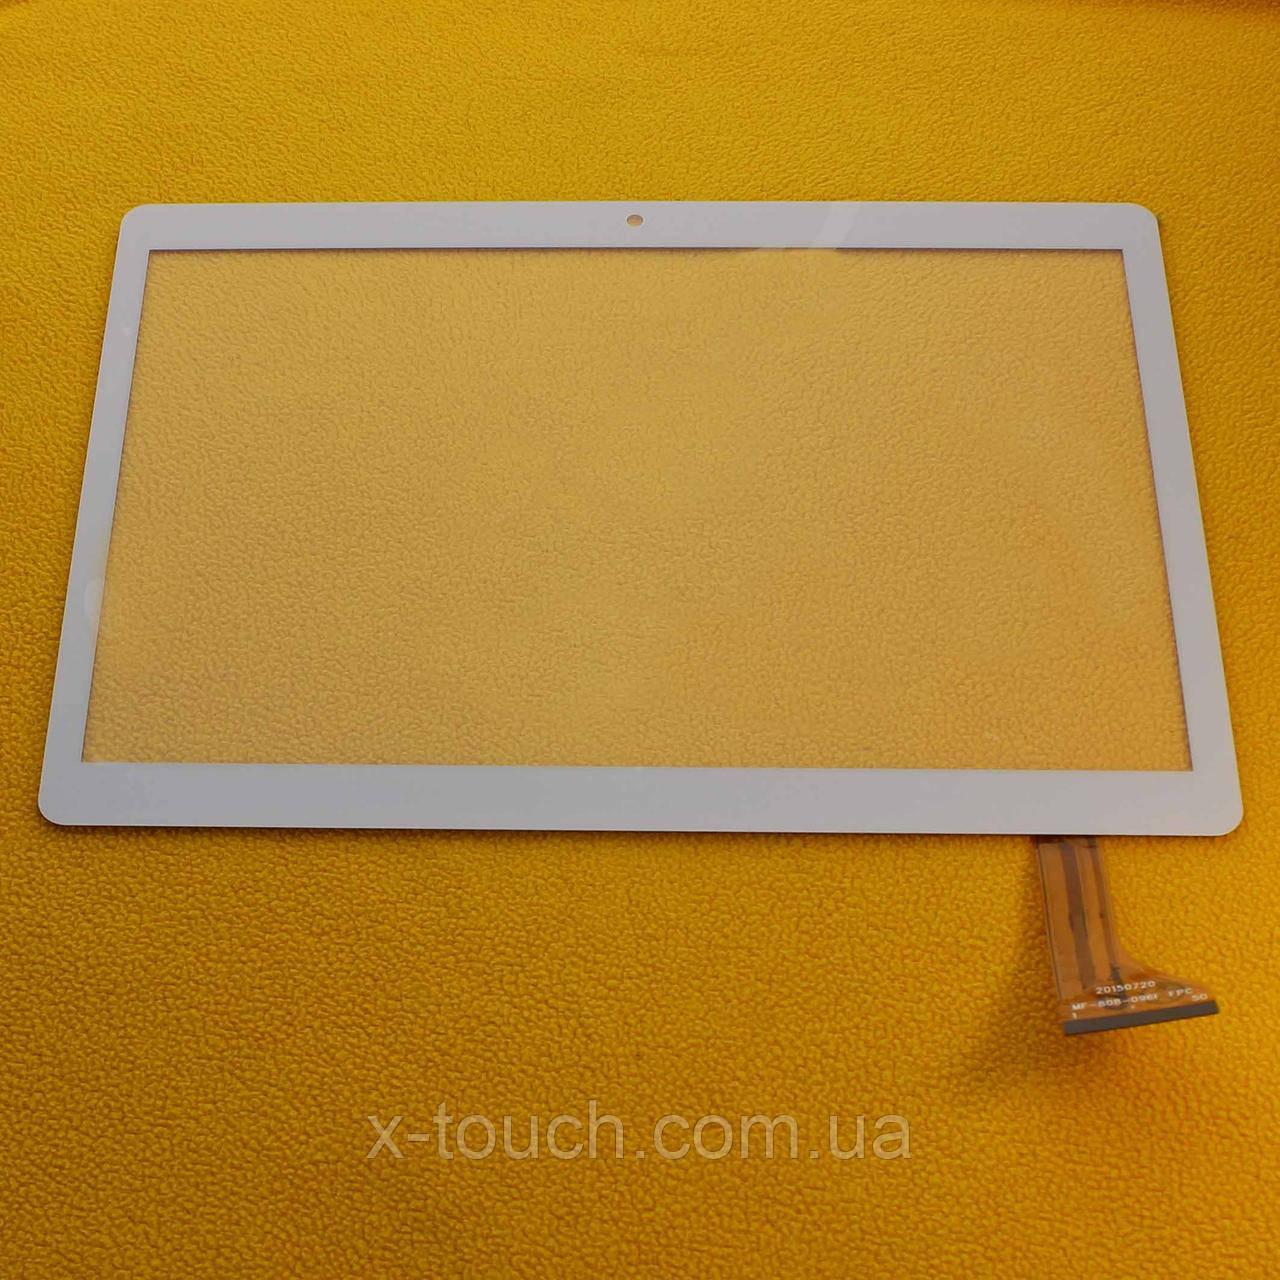 Тачскрин, сенсор  MJK-0419-FPC Белый для планшета,222х157